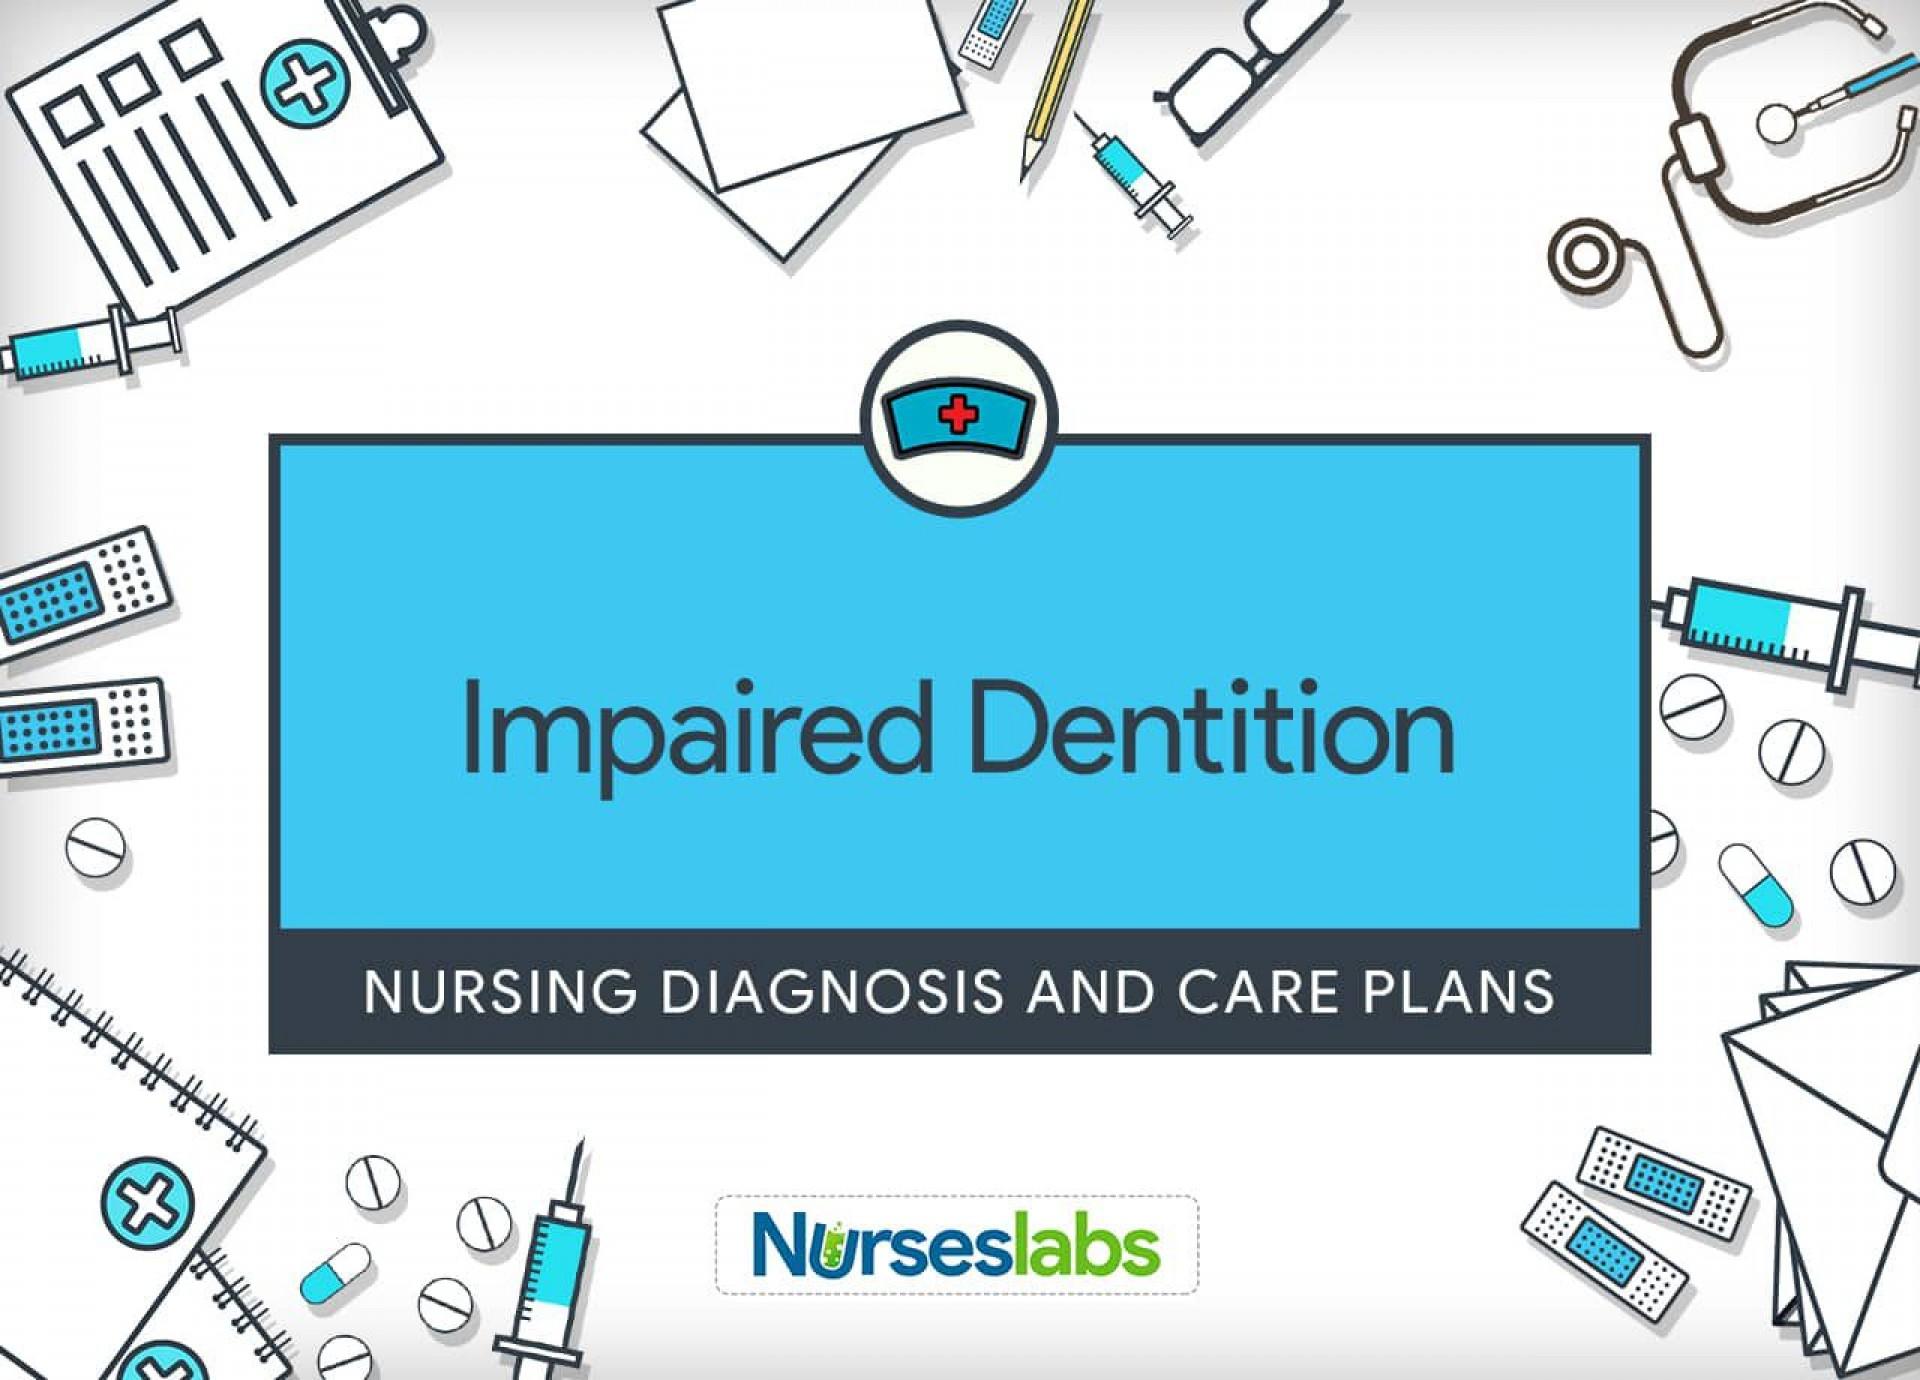 008 Unusual Personal Development Plan Template Free Dental Nurse Concept  Nurses1920